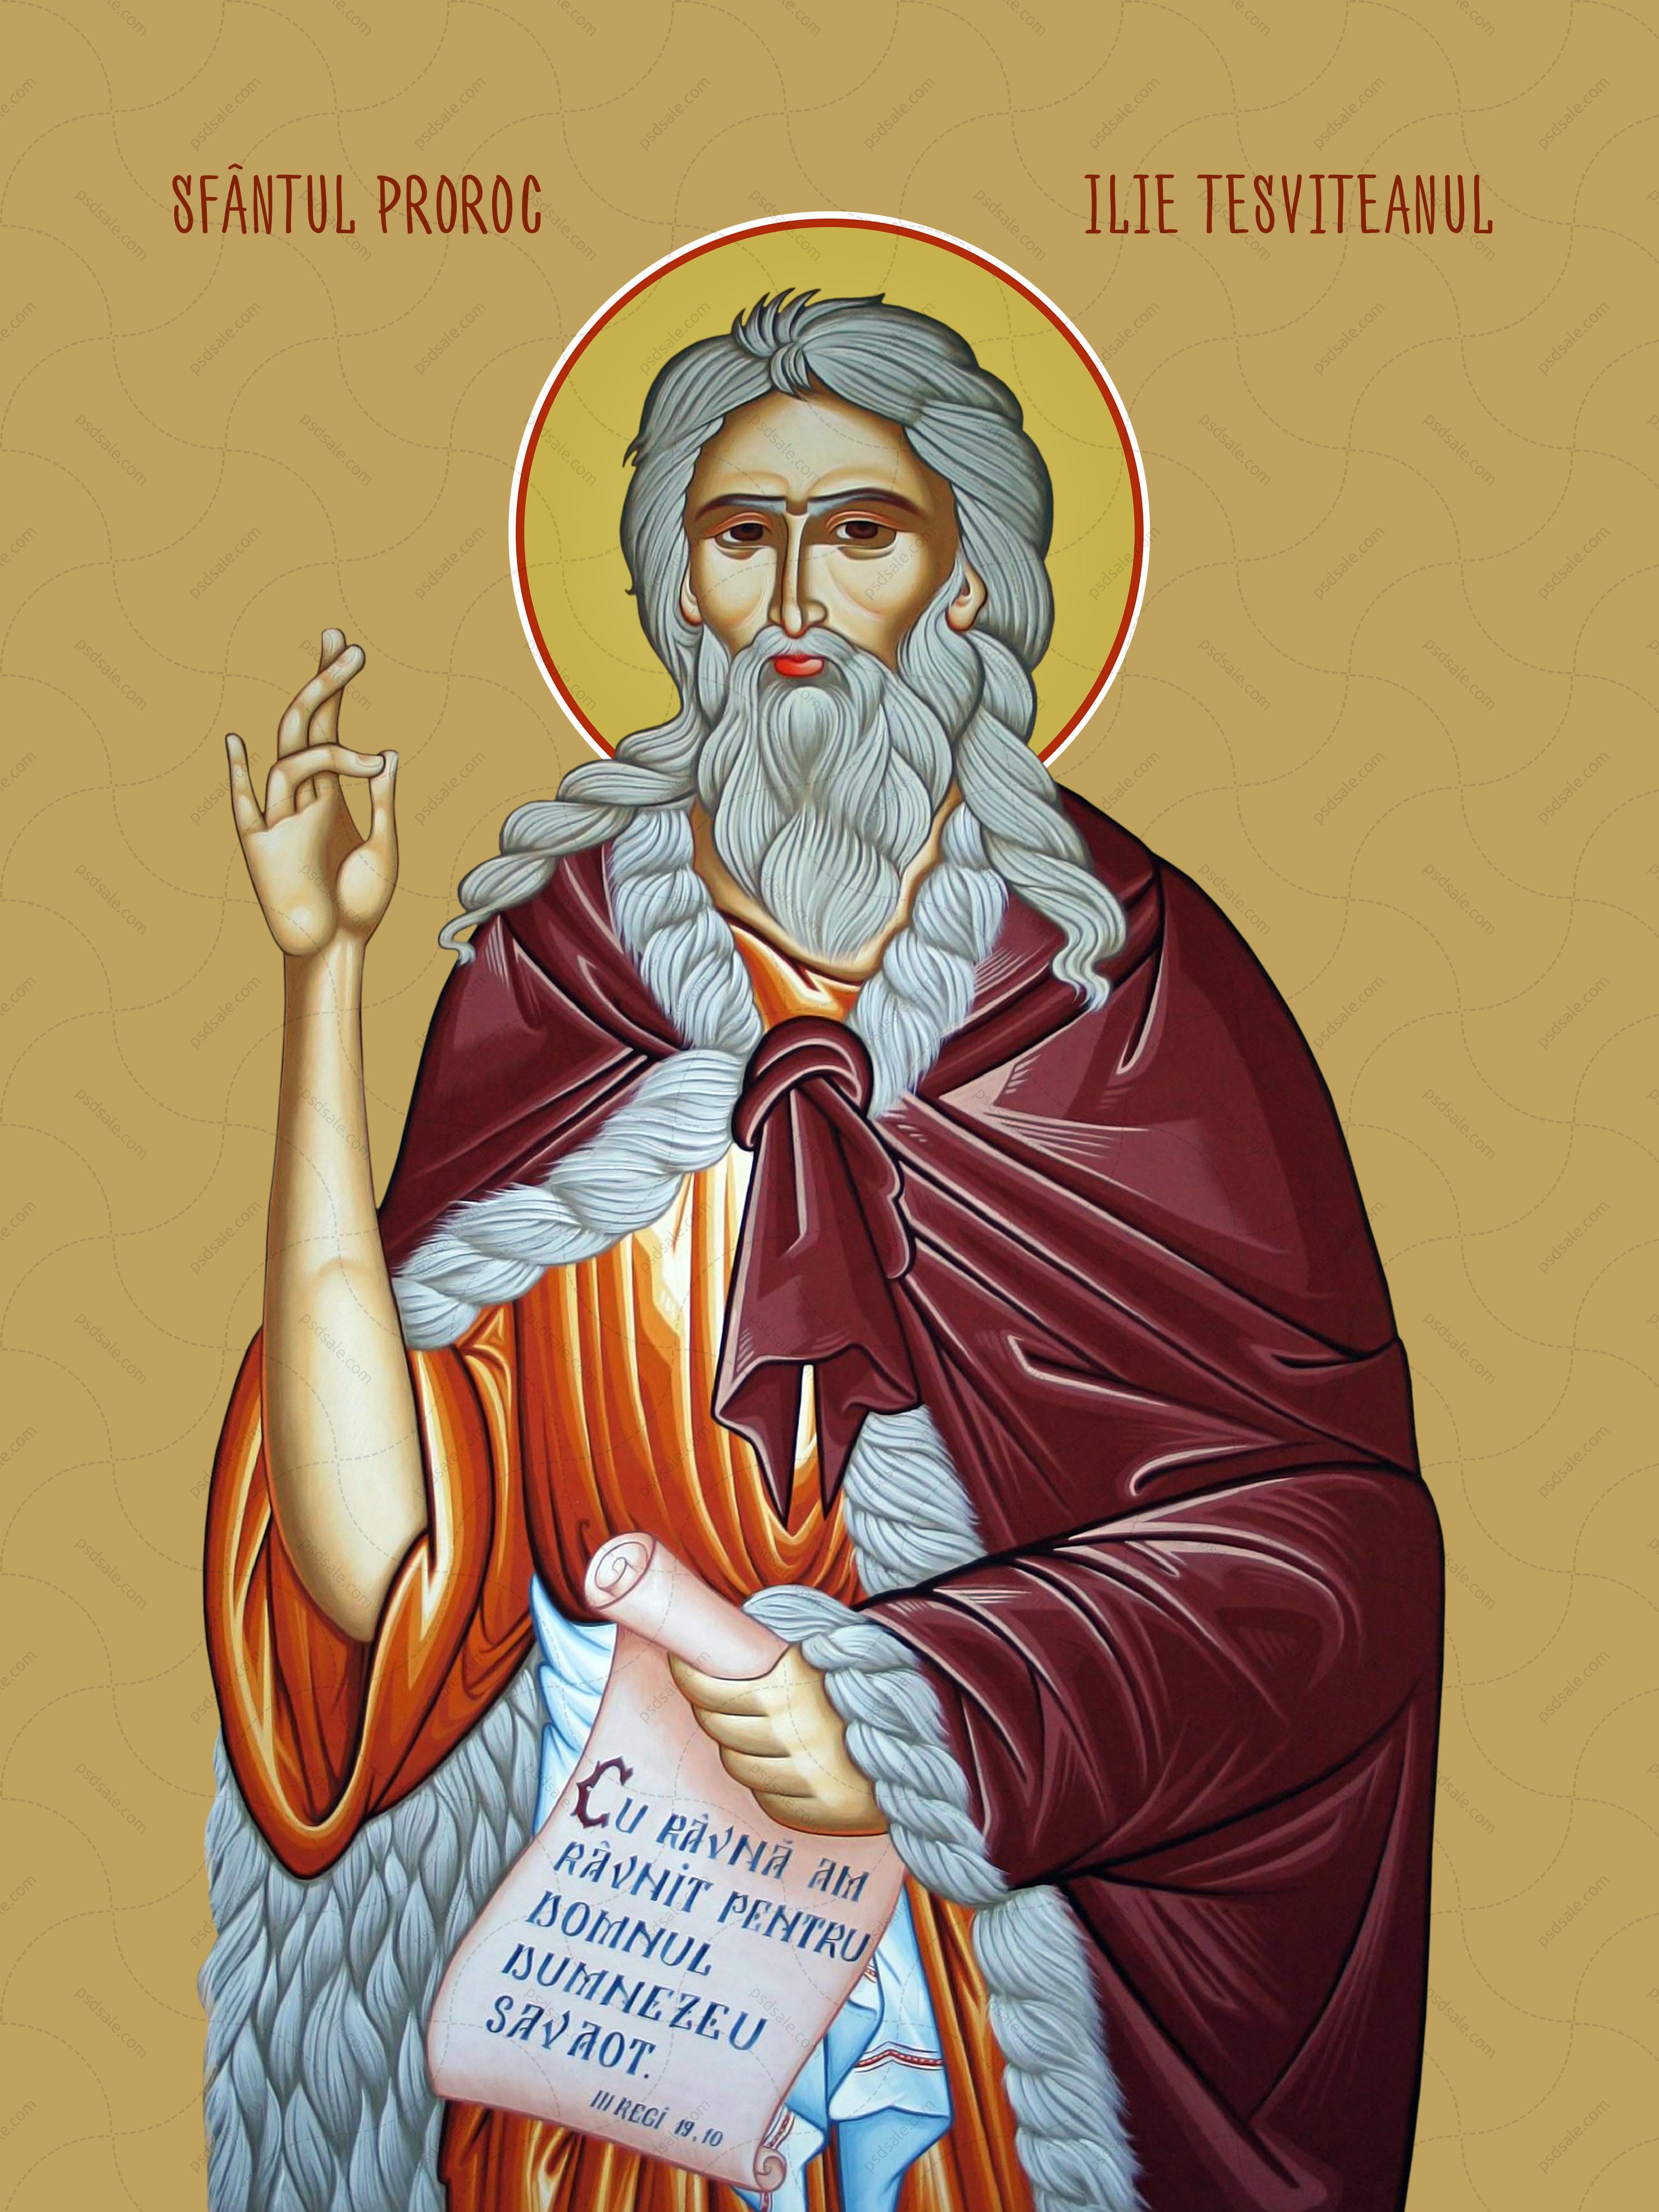 Пророк Илья / Sfântul Proroc Ilie Tesviteanul